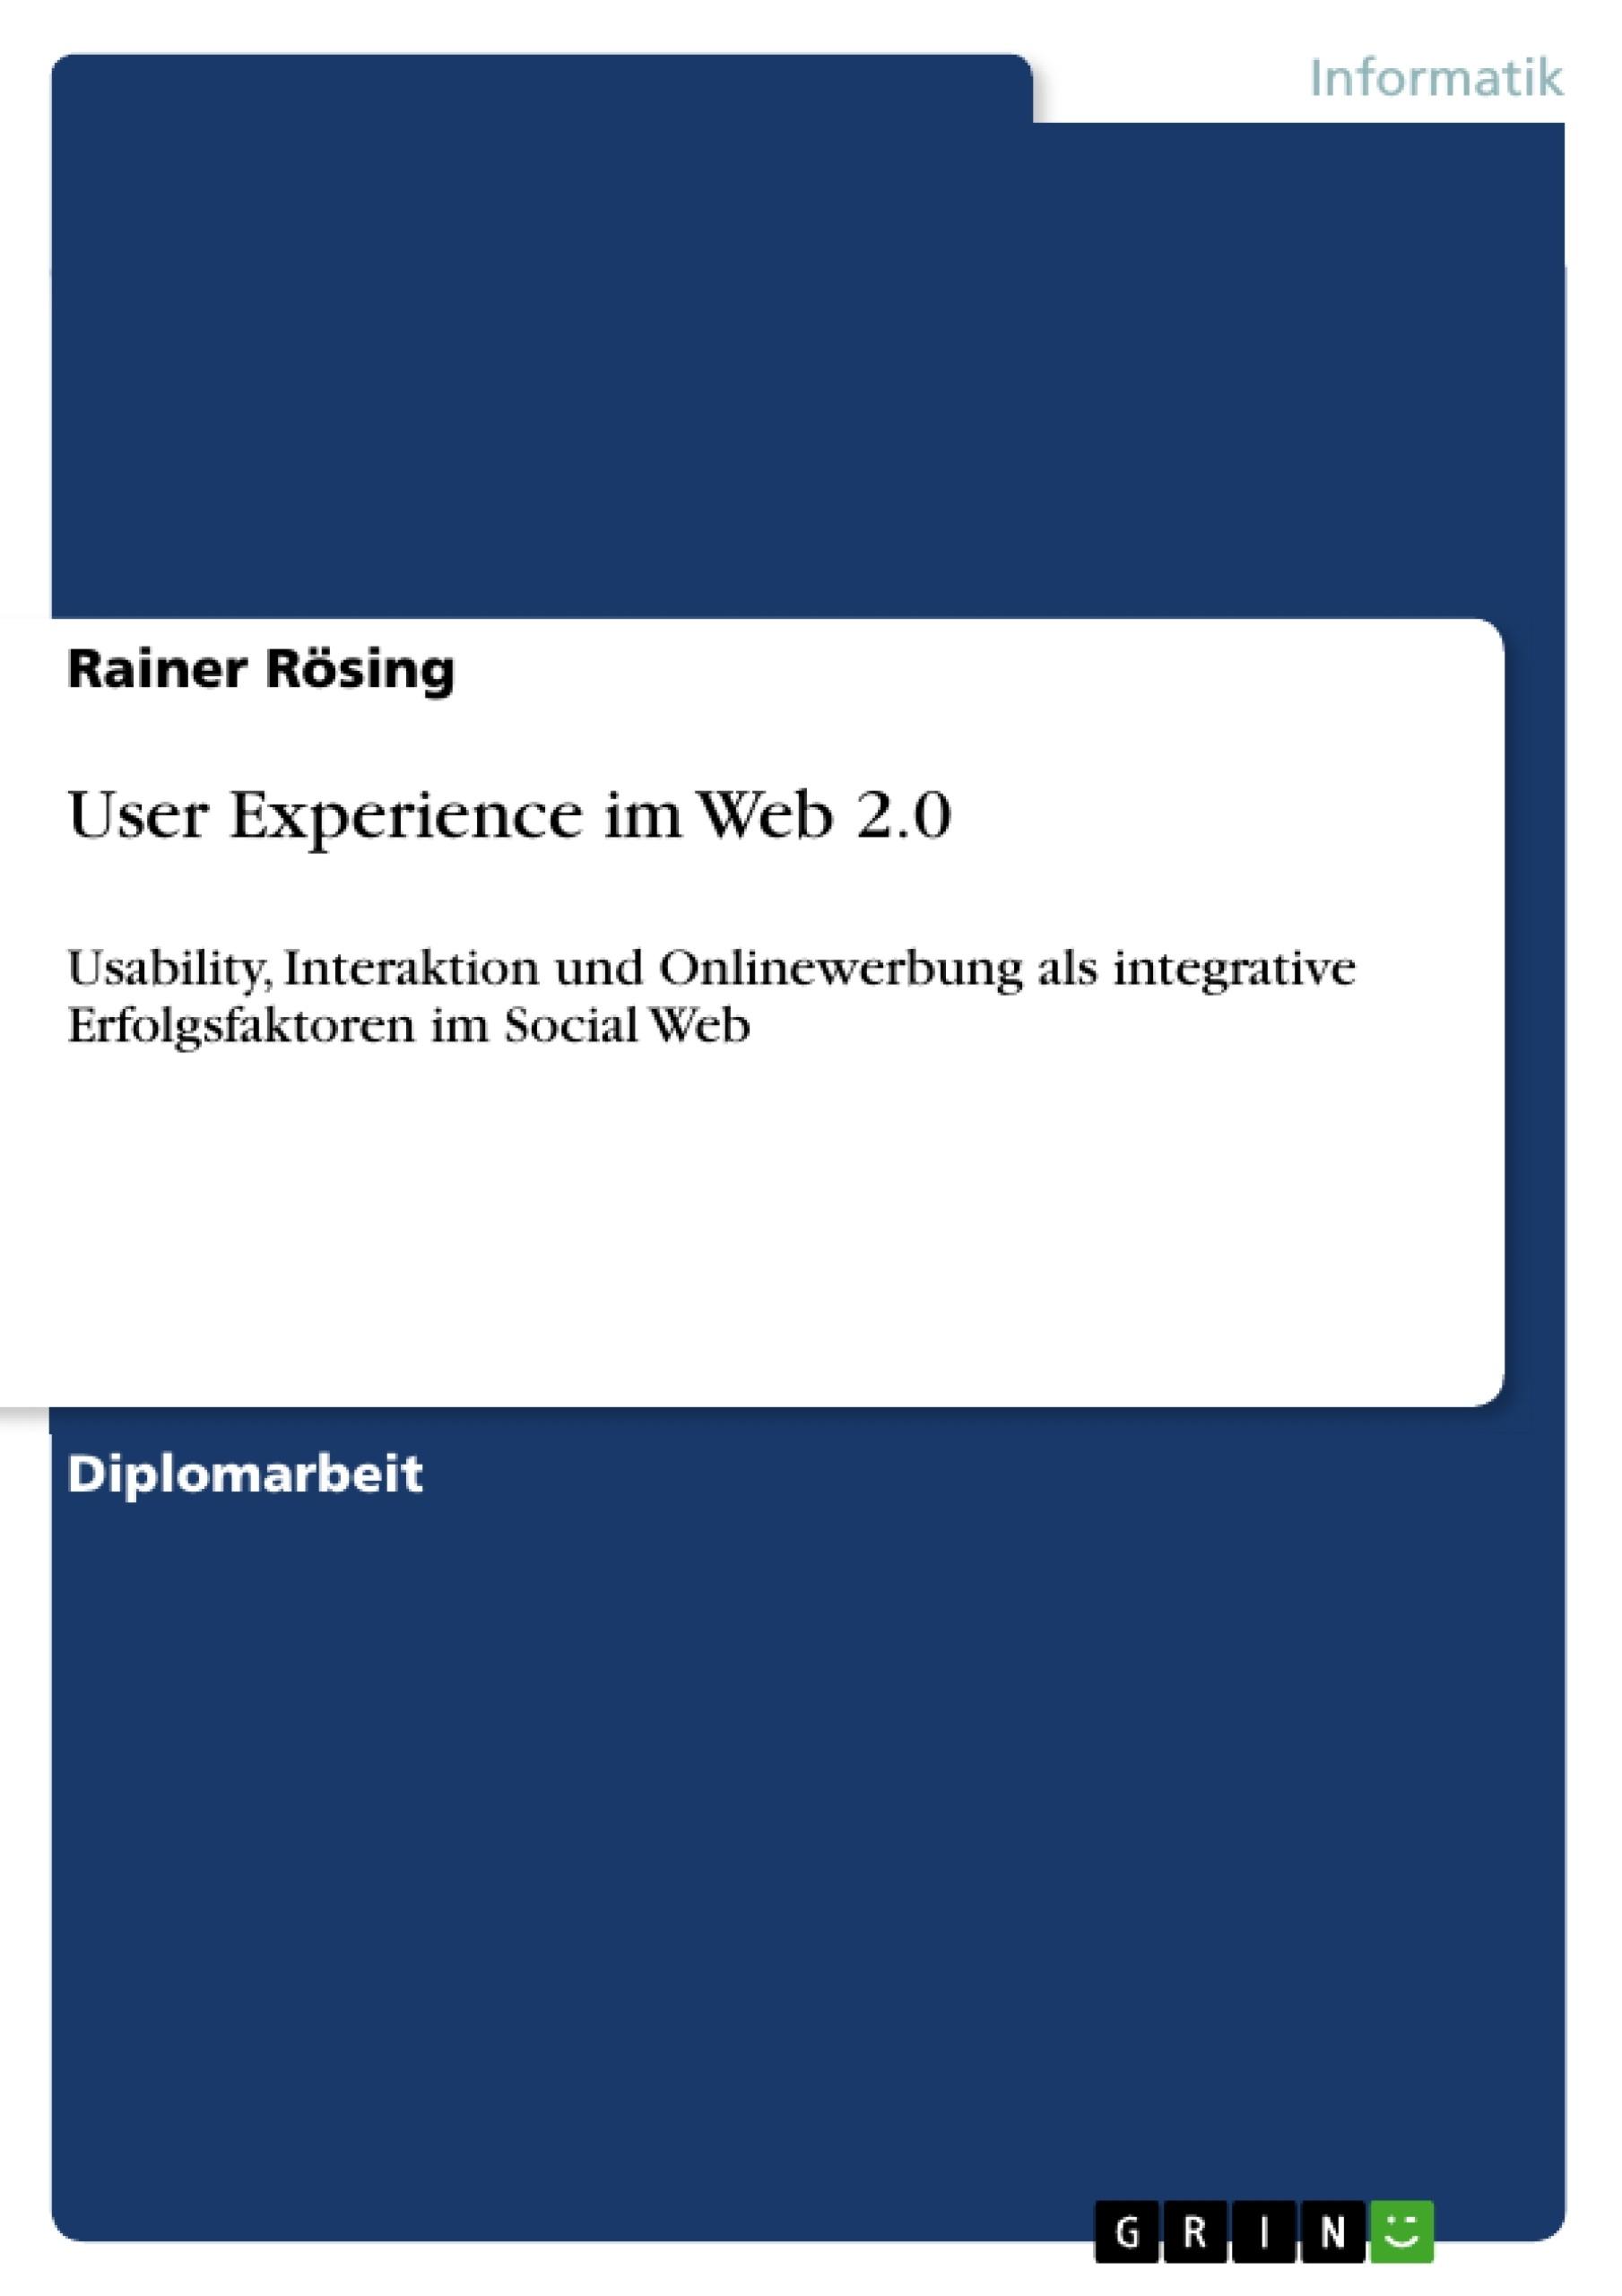 Titel: User Experience im Web 2.0